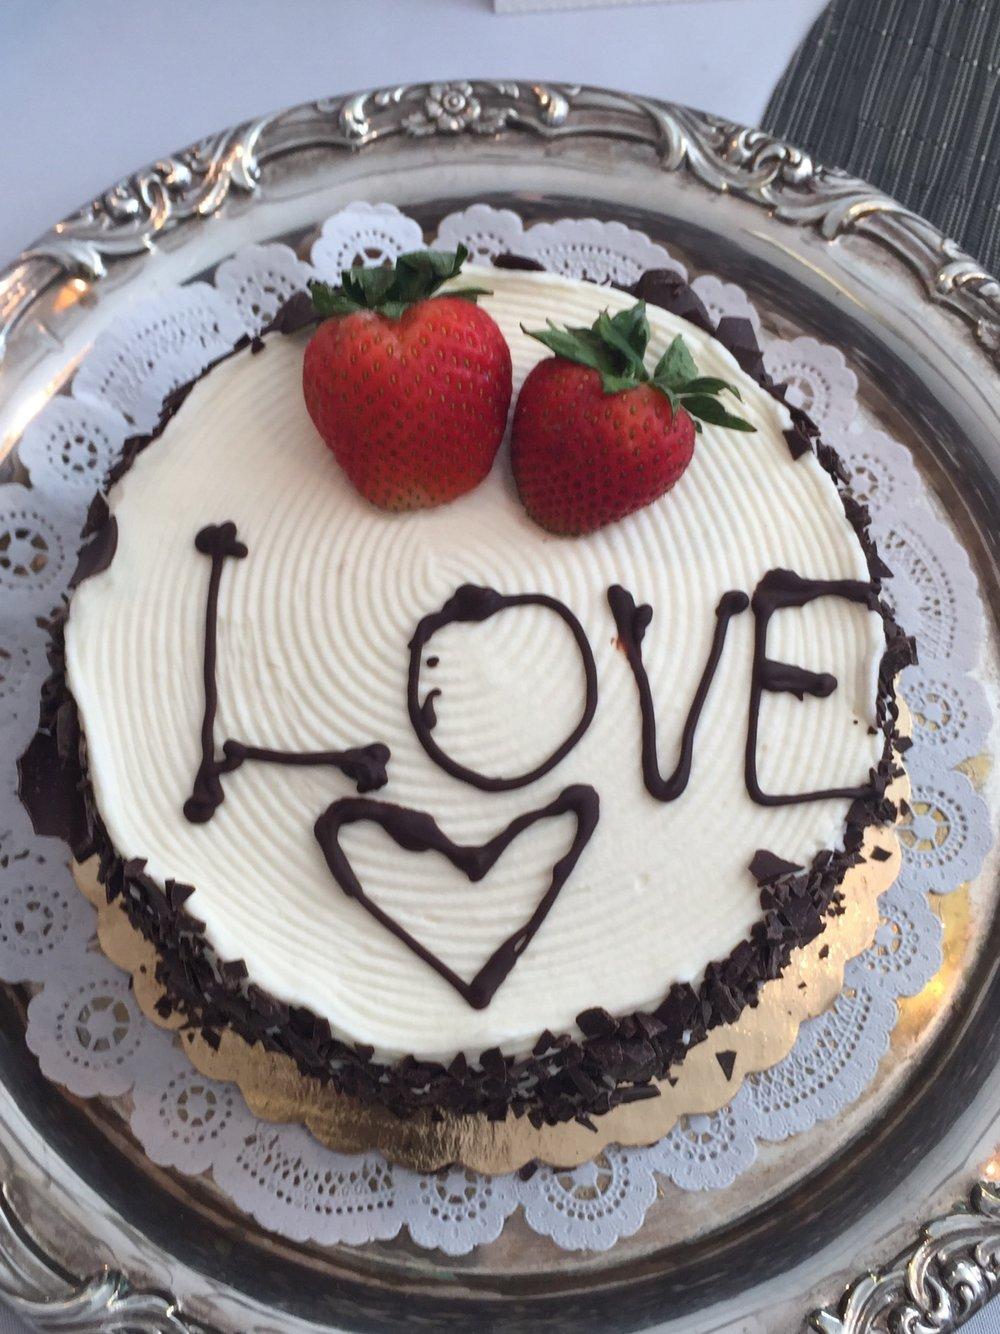 Gluten Free Cake from NoGlu Gluten Free NYC Bakery